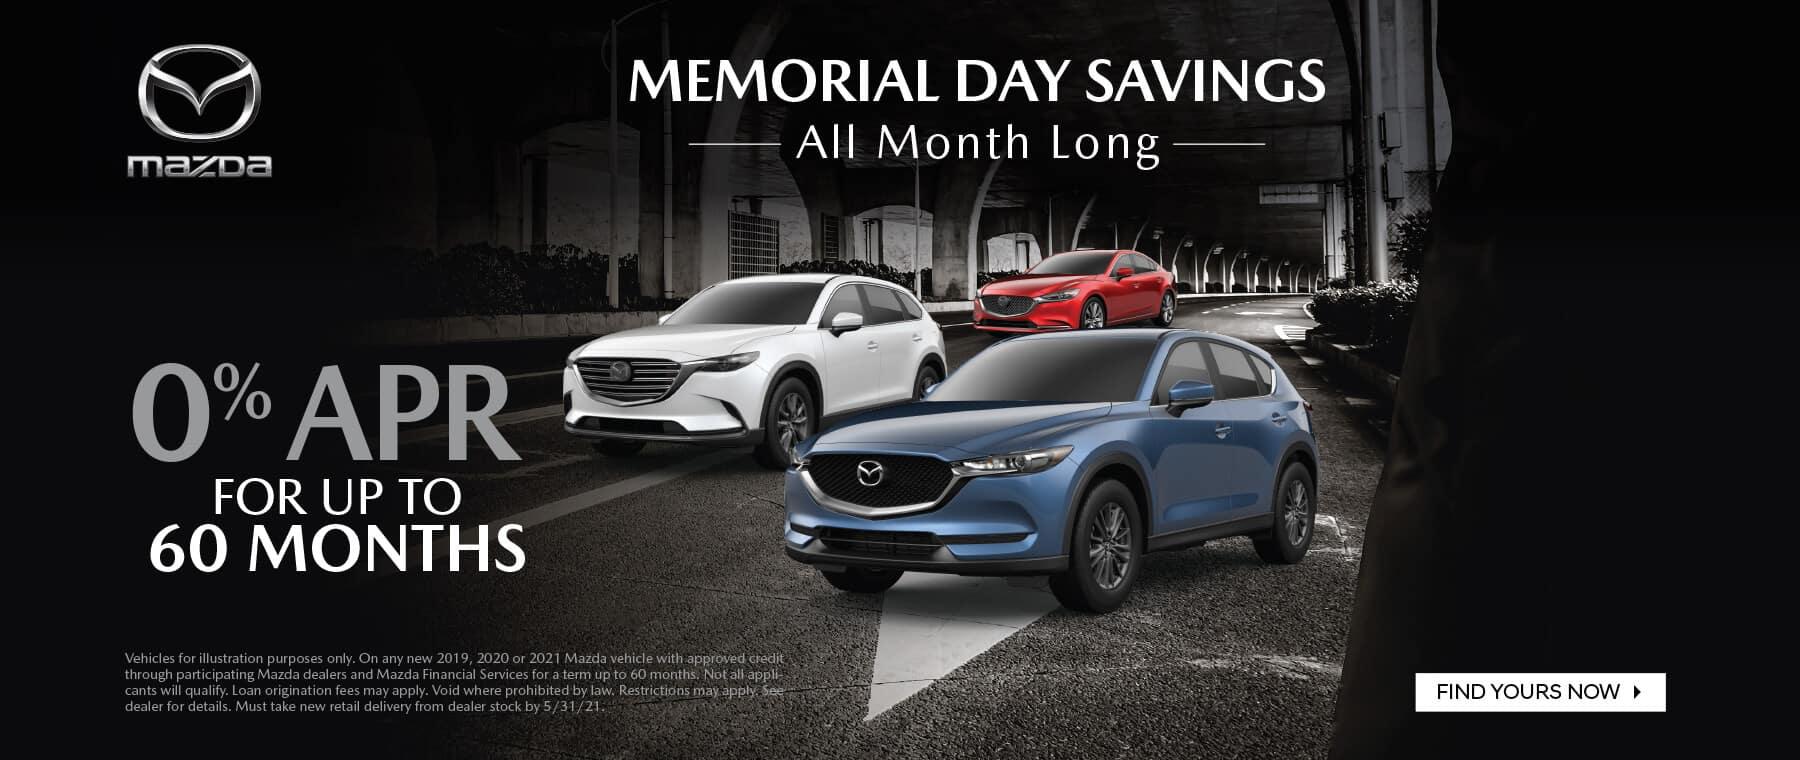 2021.05.11-Keffer-Mazda-MAY-Website-Banner-Update-S52250vw-1